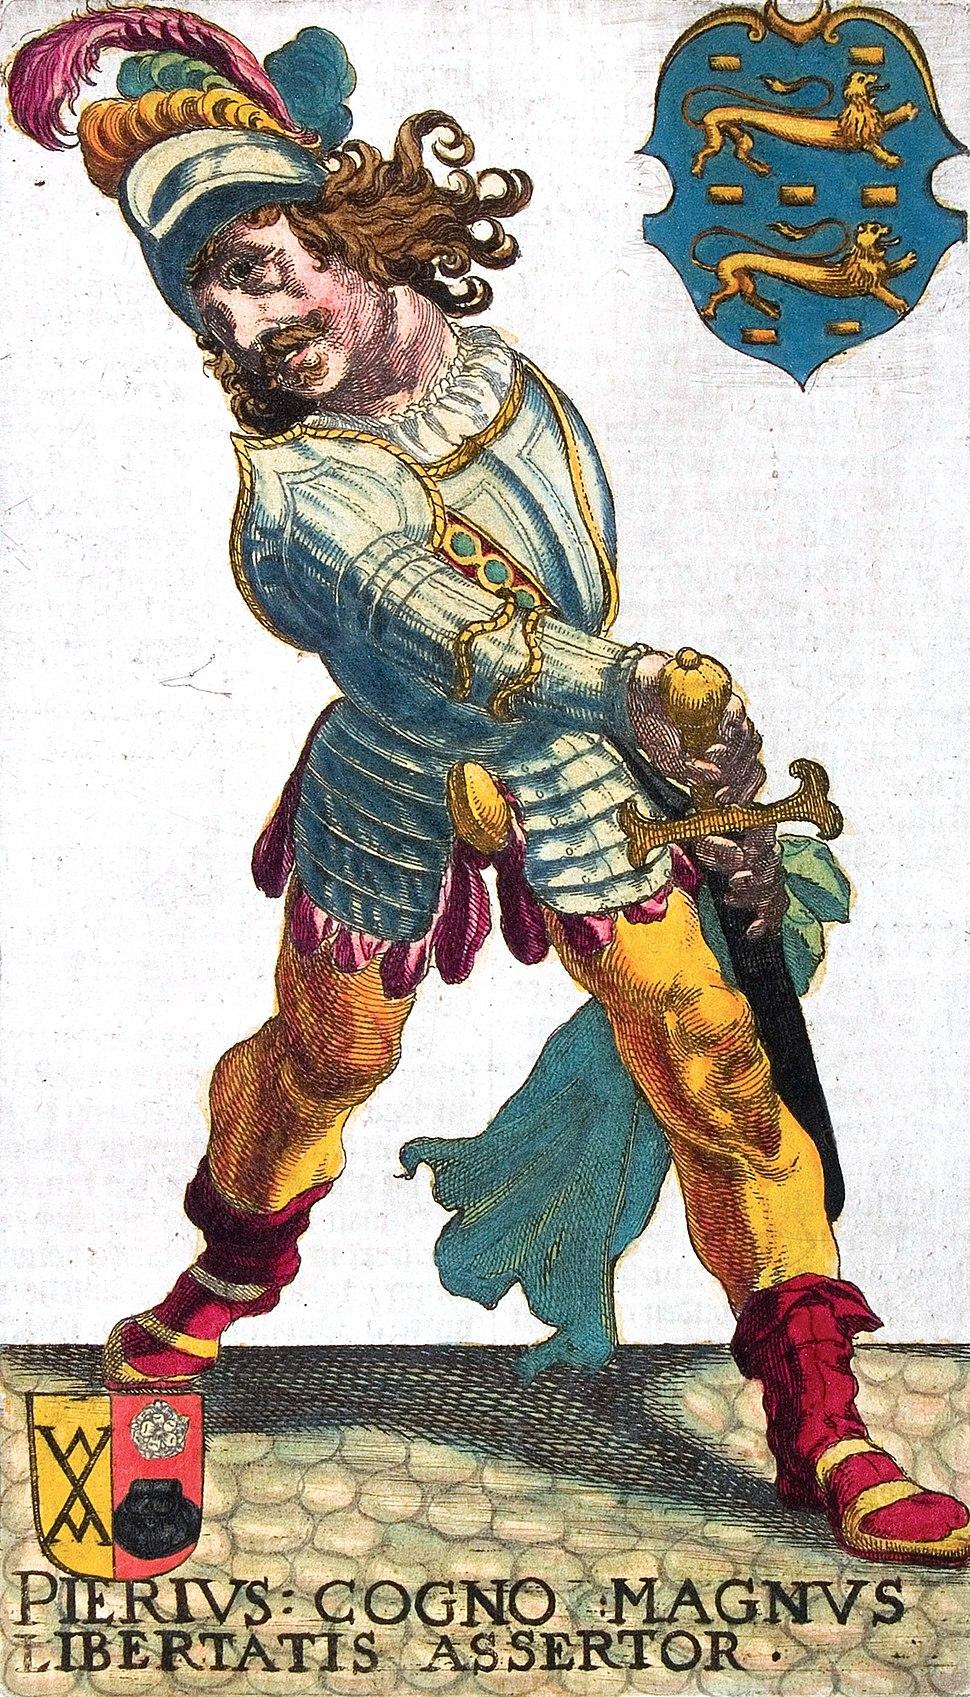 Grutte Pier (Pier Gerlofs Donia), 1622, book illustration